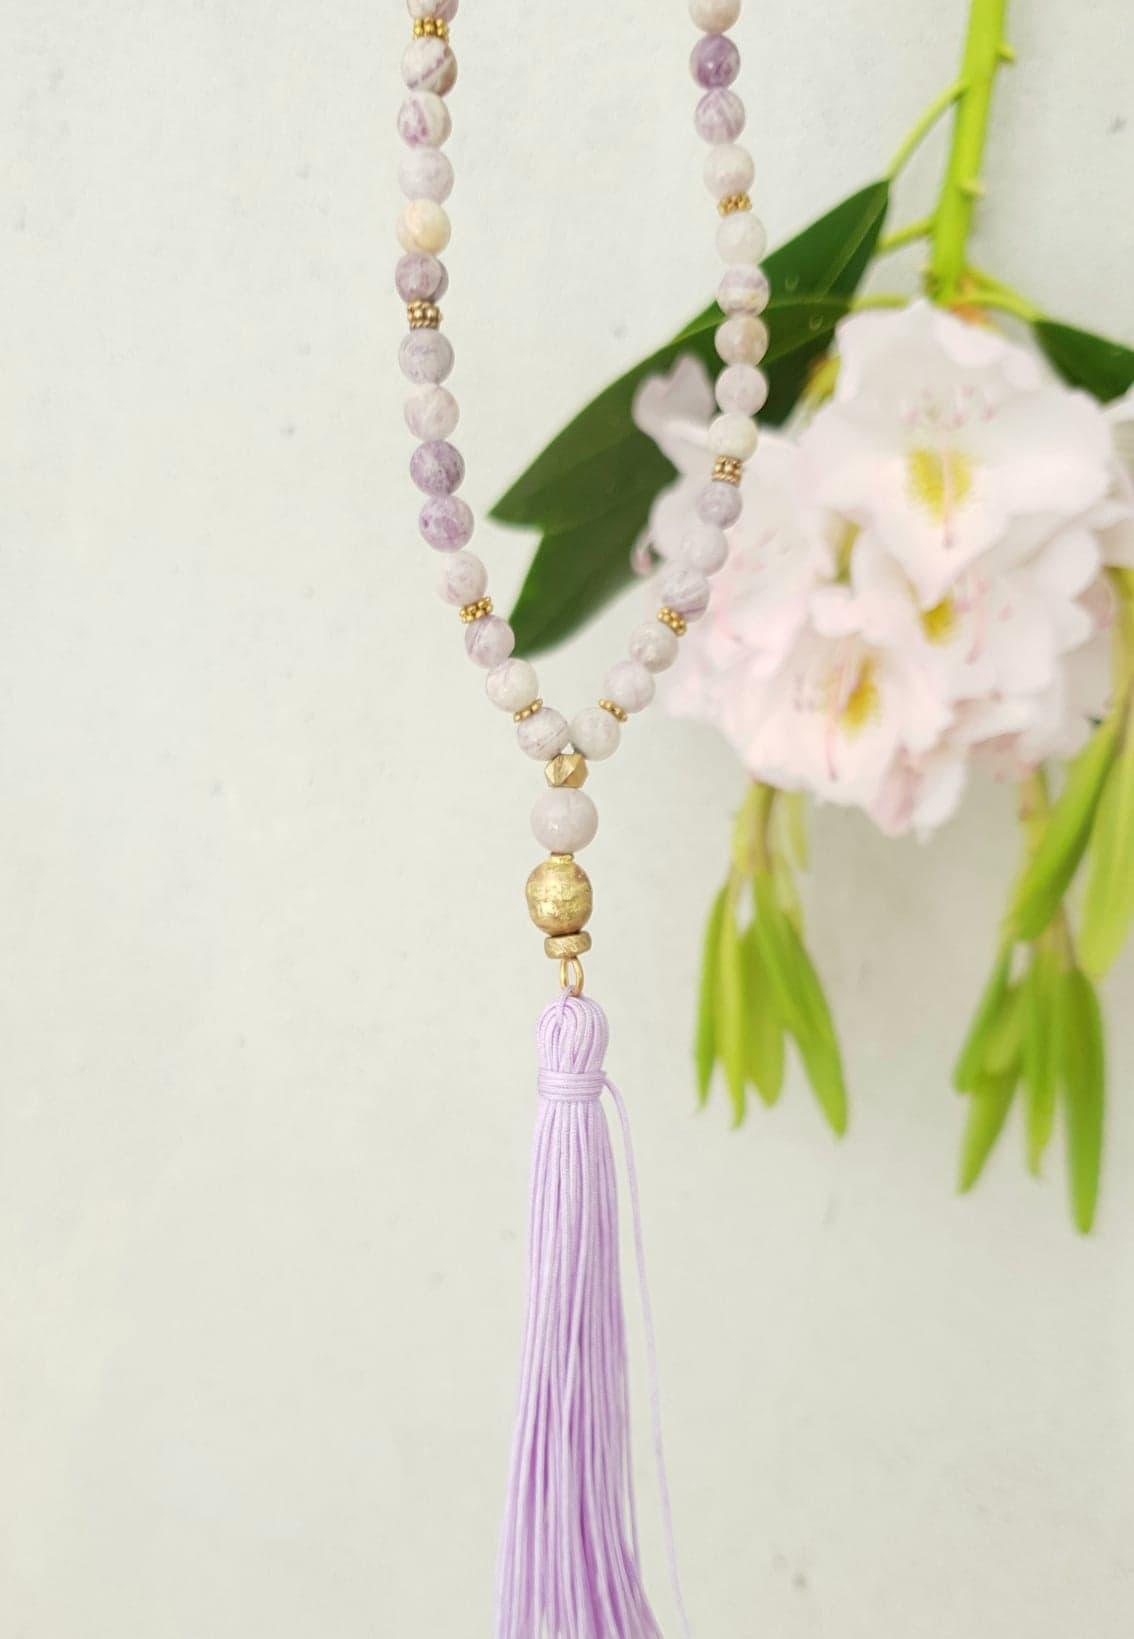 Kæde i lilla stone med kvast